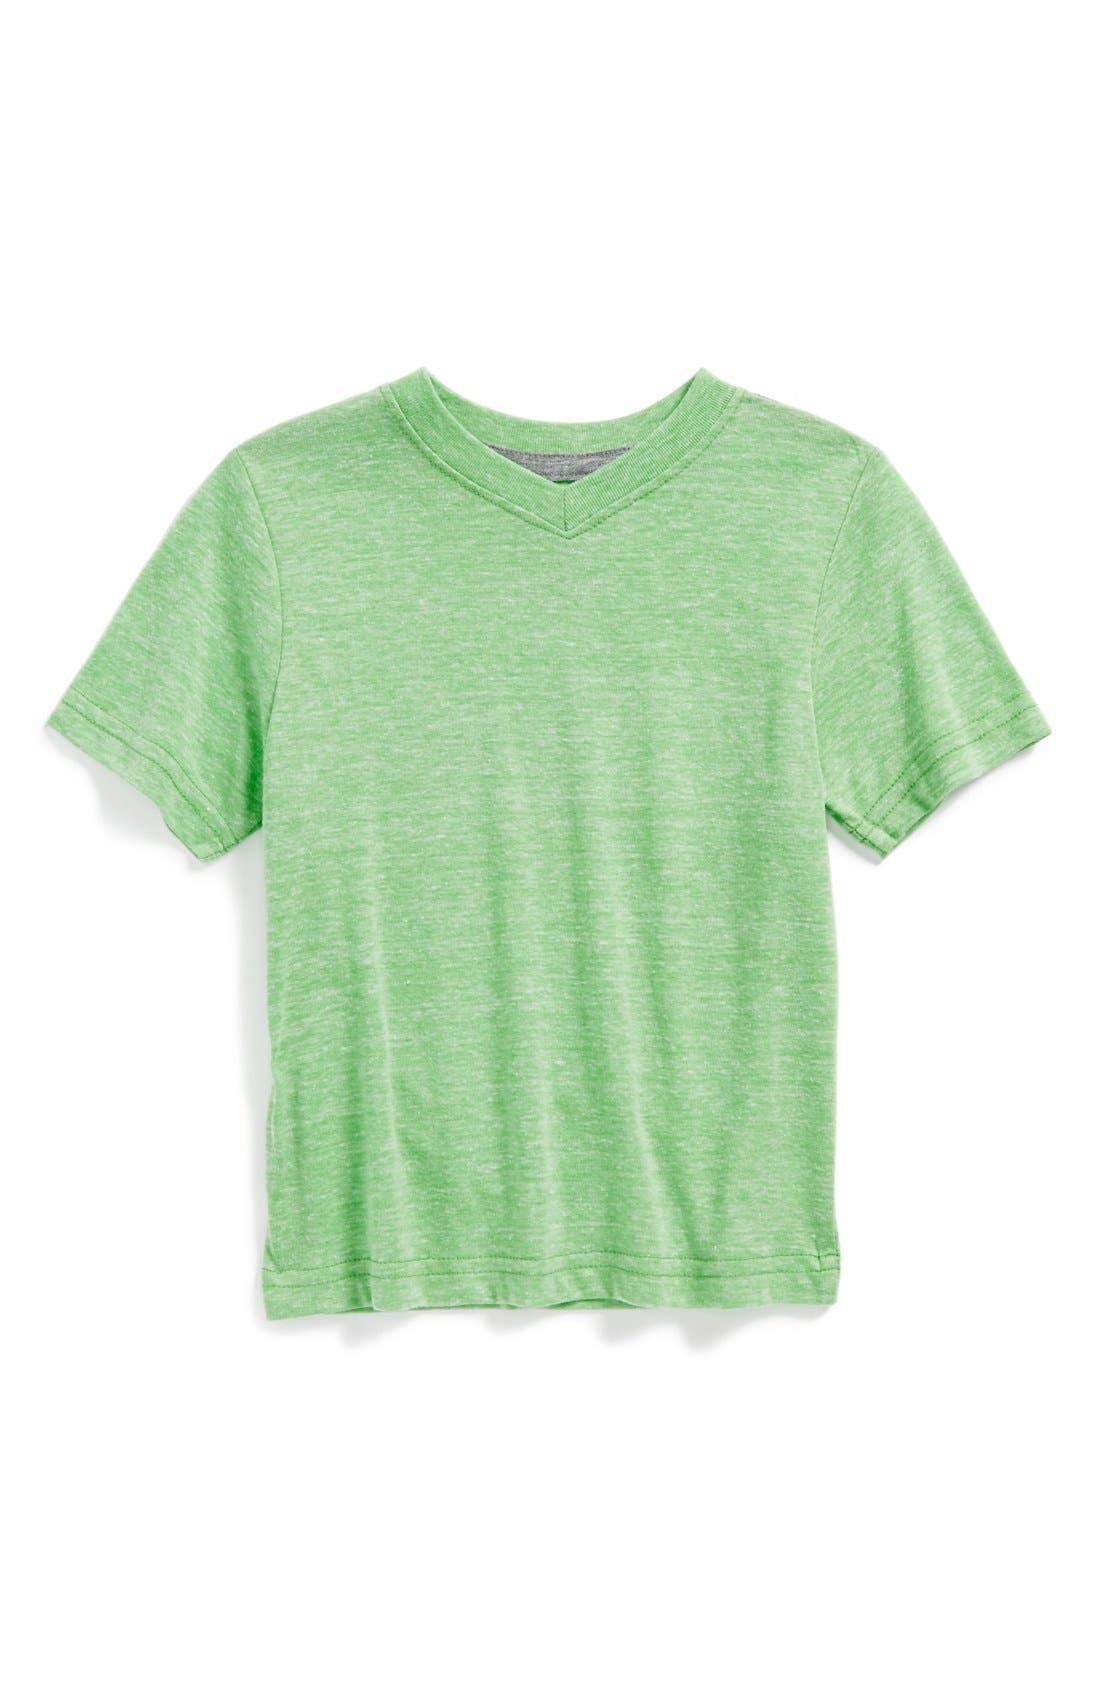 Main Image - Tucker + Tate 'Vance' V-Neck T-Shirt (Big Boys)